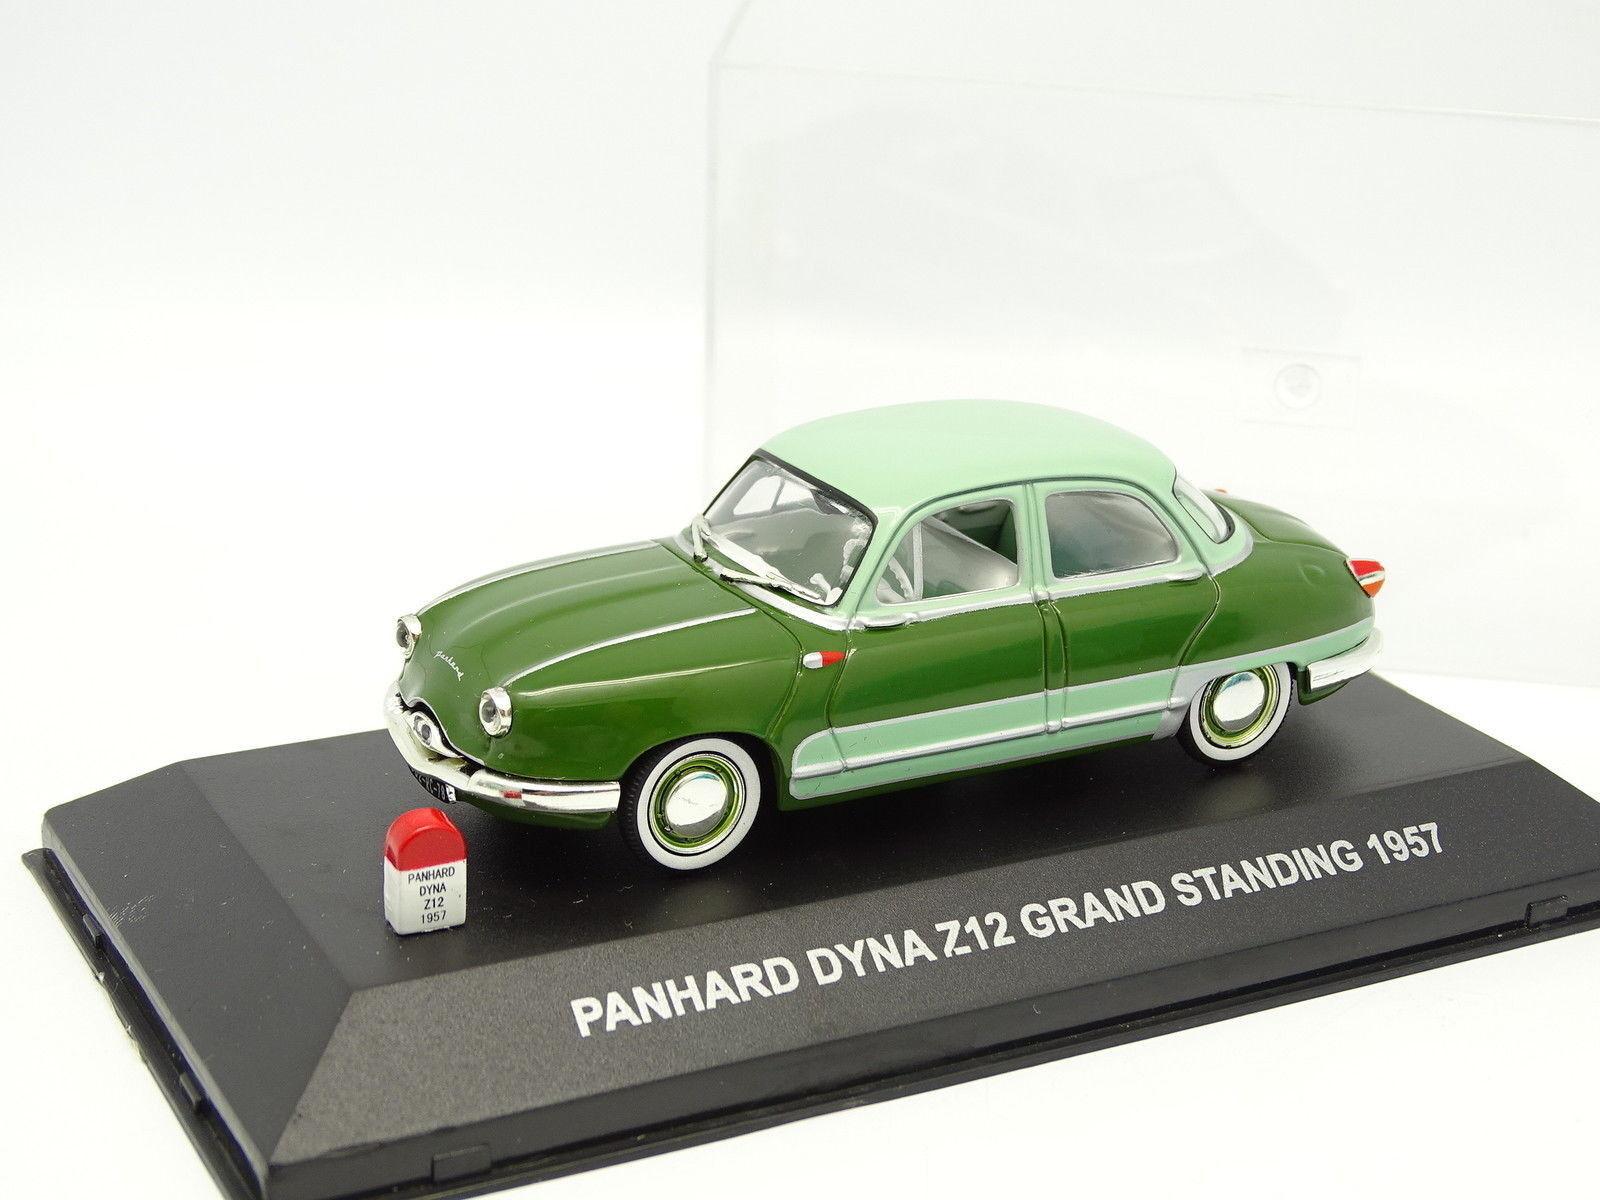 Nostalgie 1 43 - Panhard Panhard Panhard Dyna Z12 Luxury 1957 2ec826